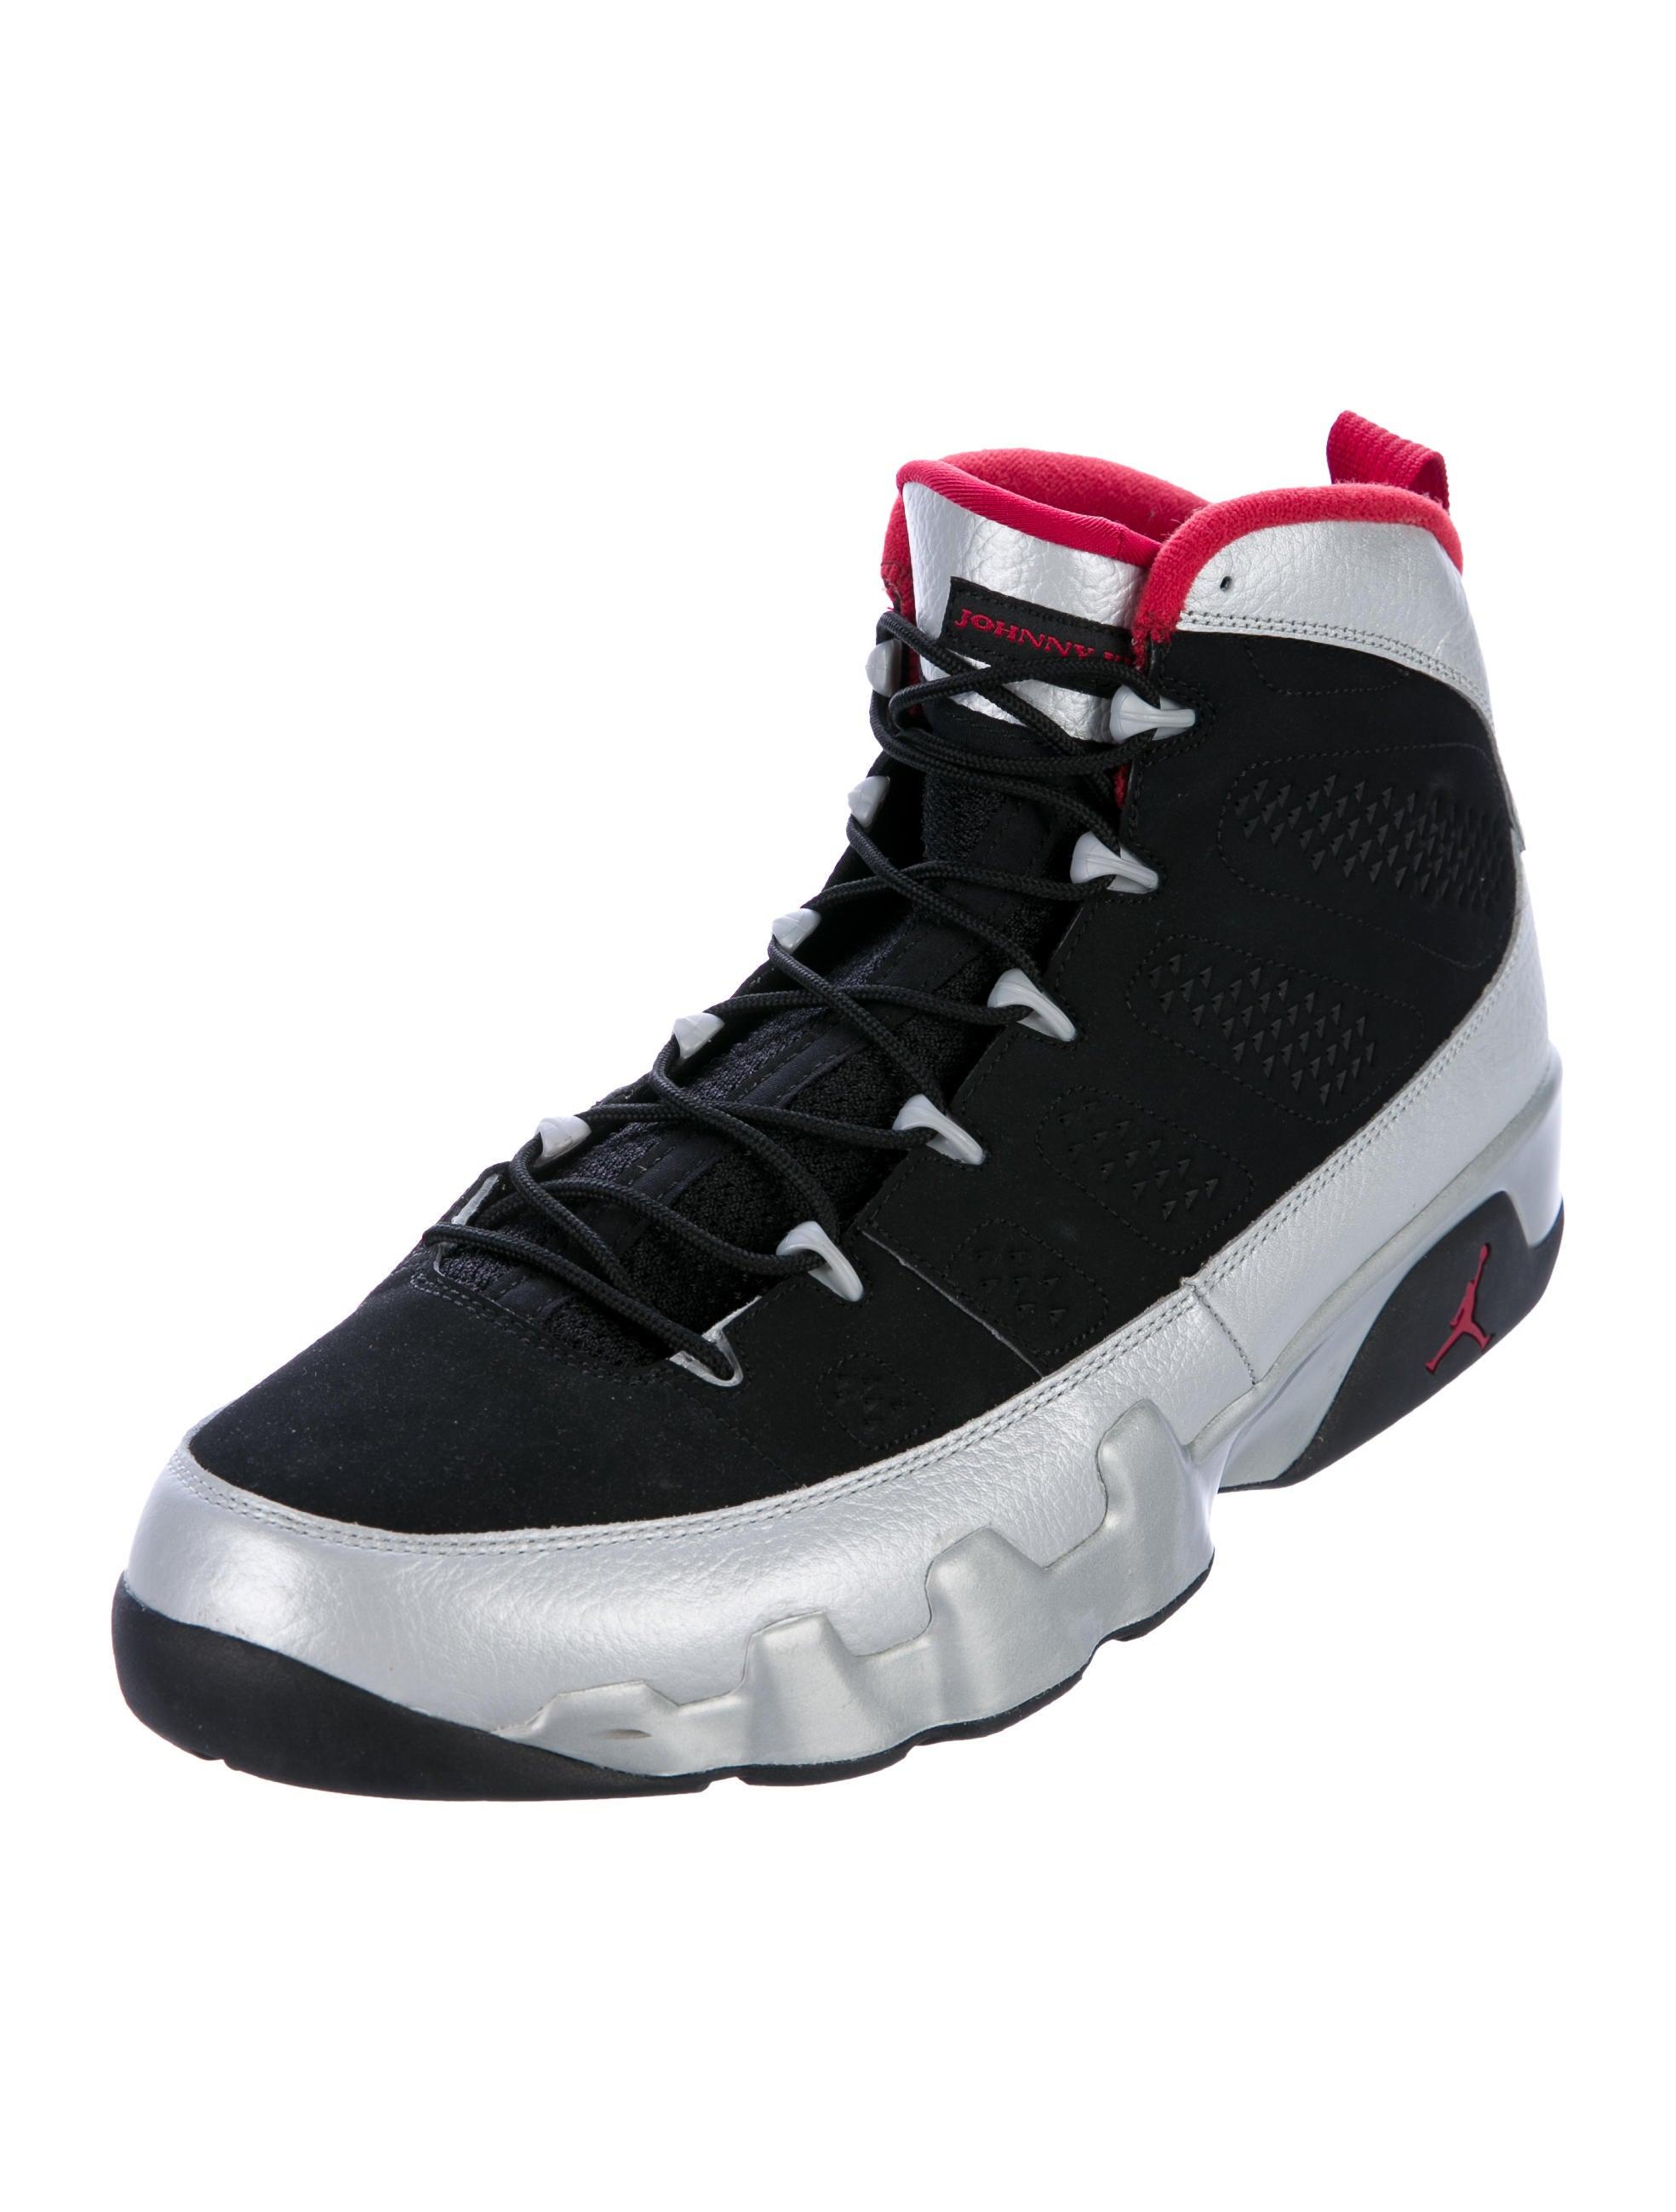 Air Jordan 30 Xxx Limited Colour Way Fesyen Pria Sepatu Di Ctt Sneakers Wanita Love White